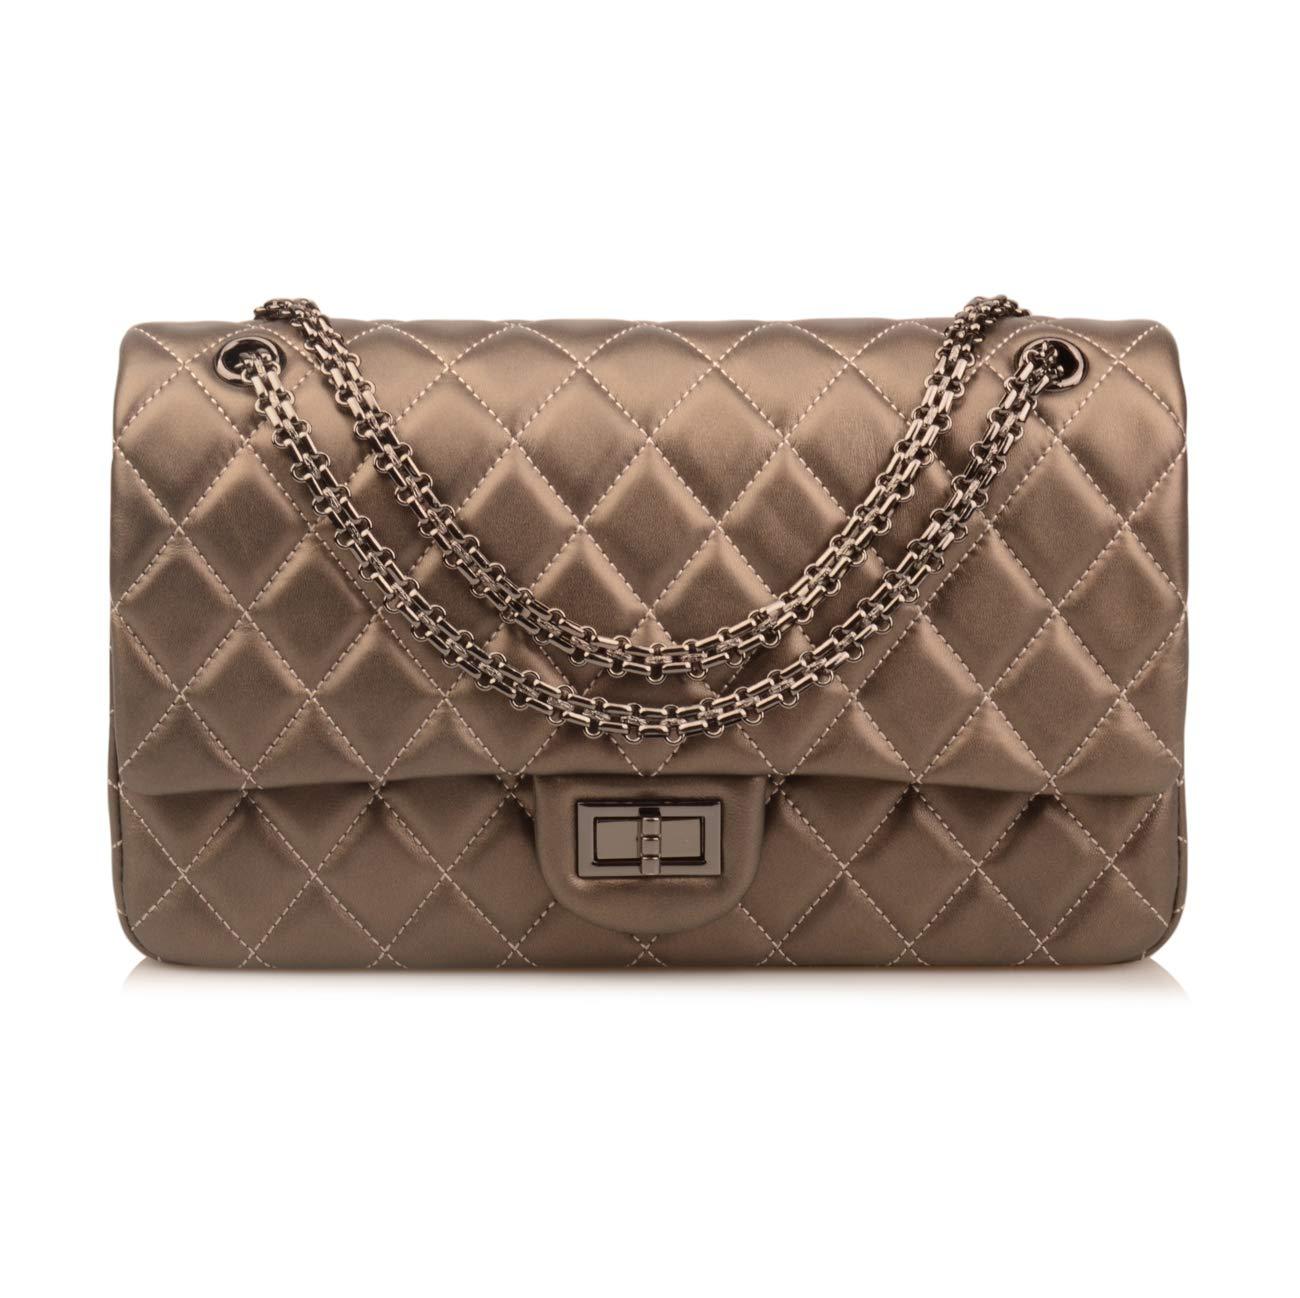 Ainifeel Women's Genuine Leather Quilted Shoulder Handbag Hobo Bag Crossbody Purse Gunmetal hardware (Large, Metal Khaki)